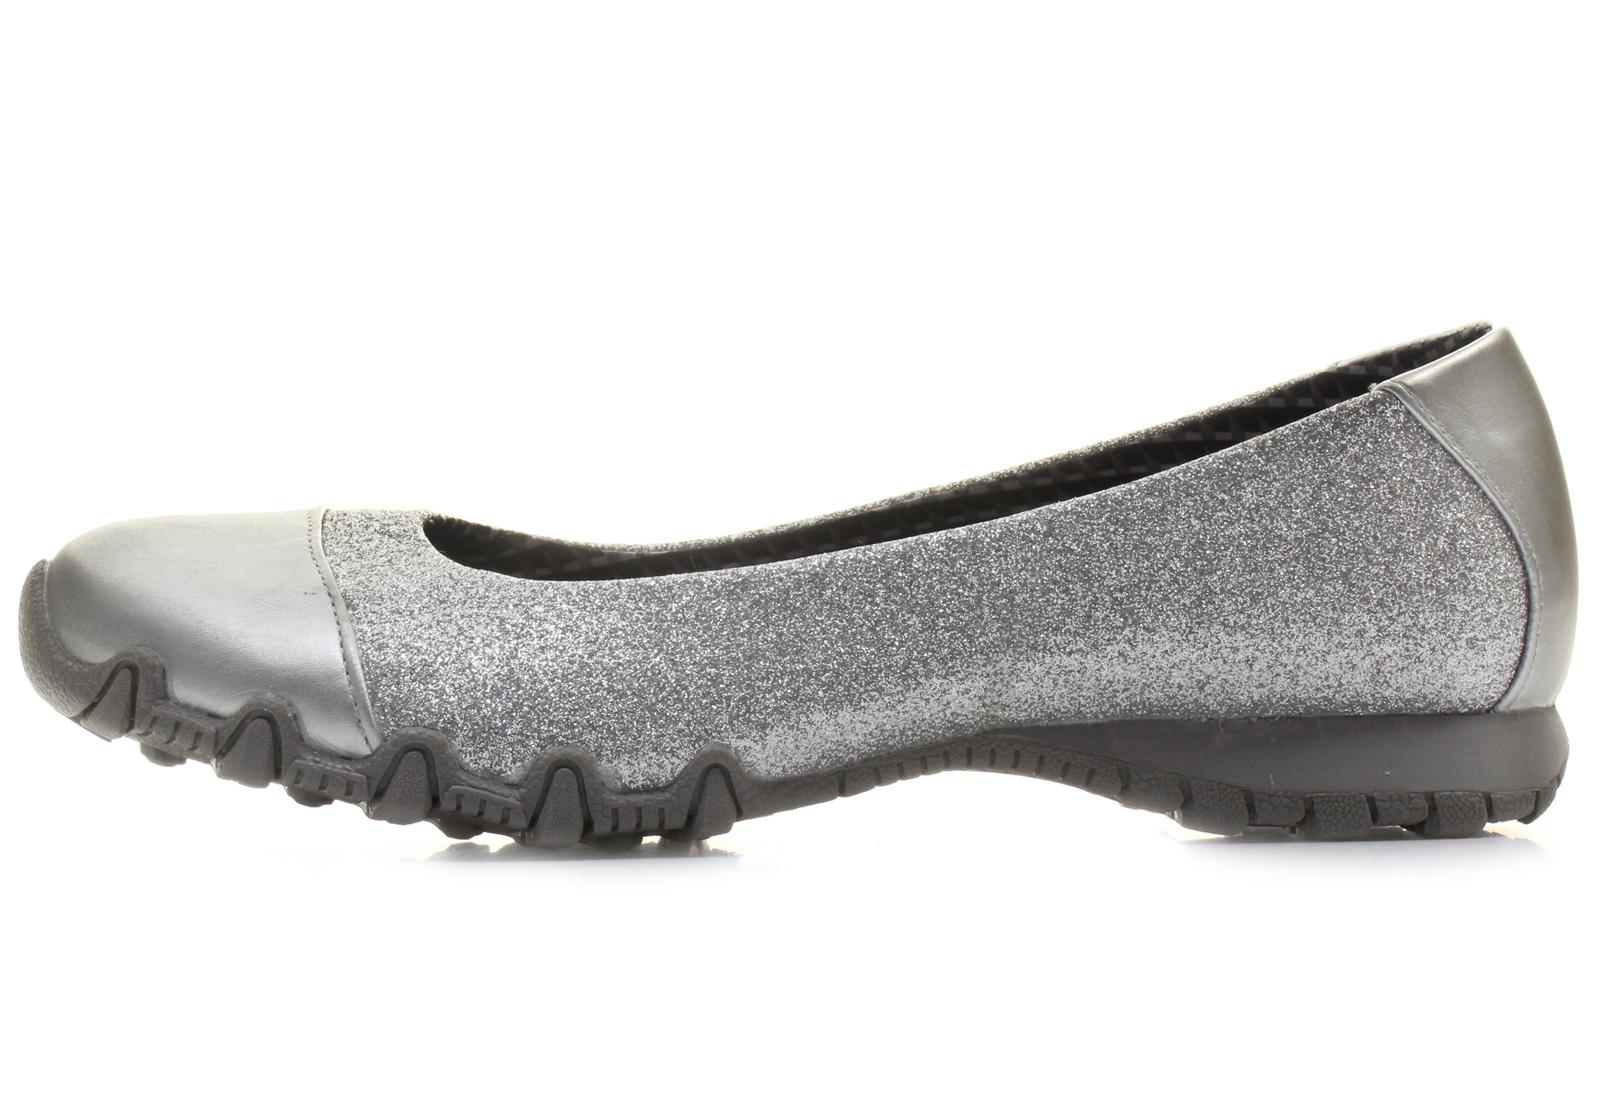 c2adc3e5df Skechers Balerina - Glitzy Sparkle - 48915-sil - Online shop for ...